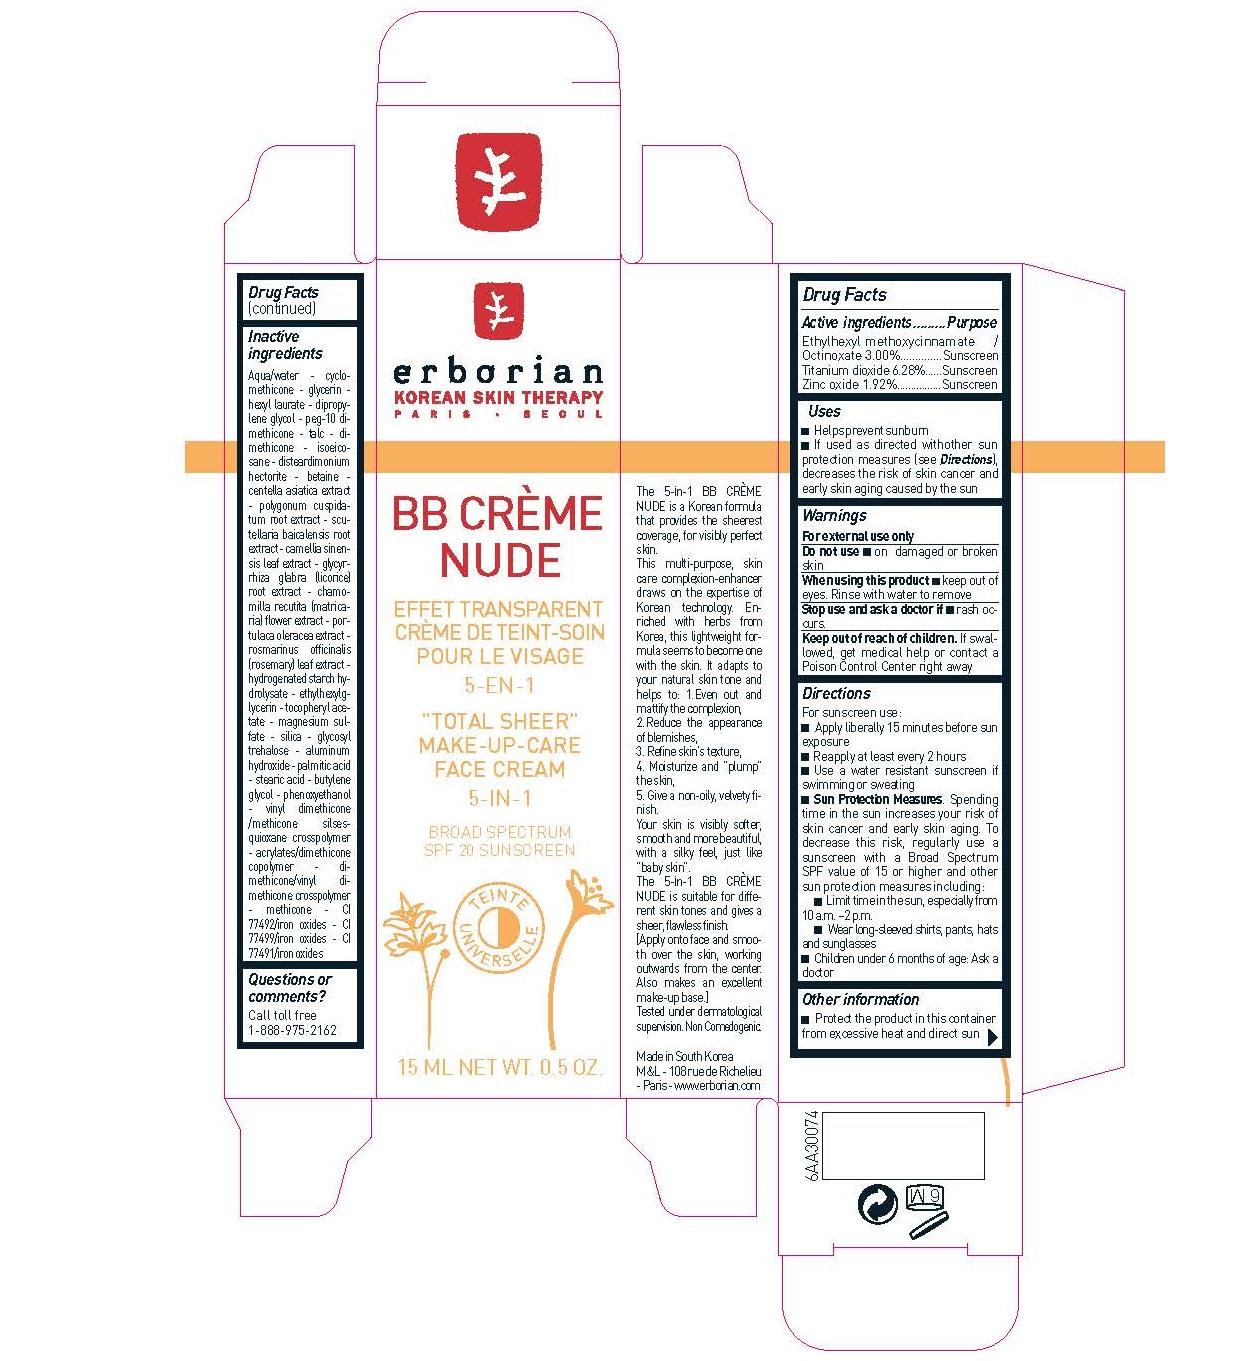 DailyMed - ERBORIAN - BB CREME NUDE SPF20- octinoxate